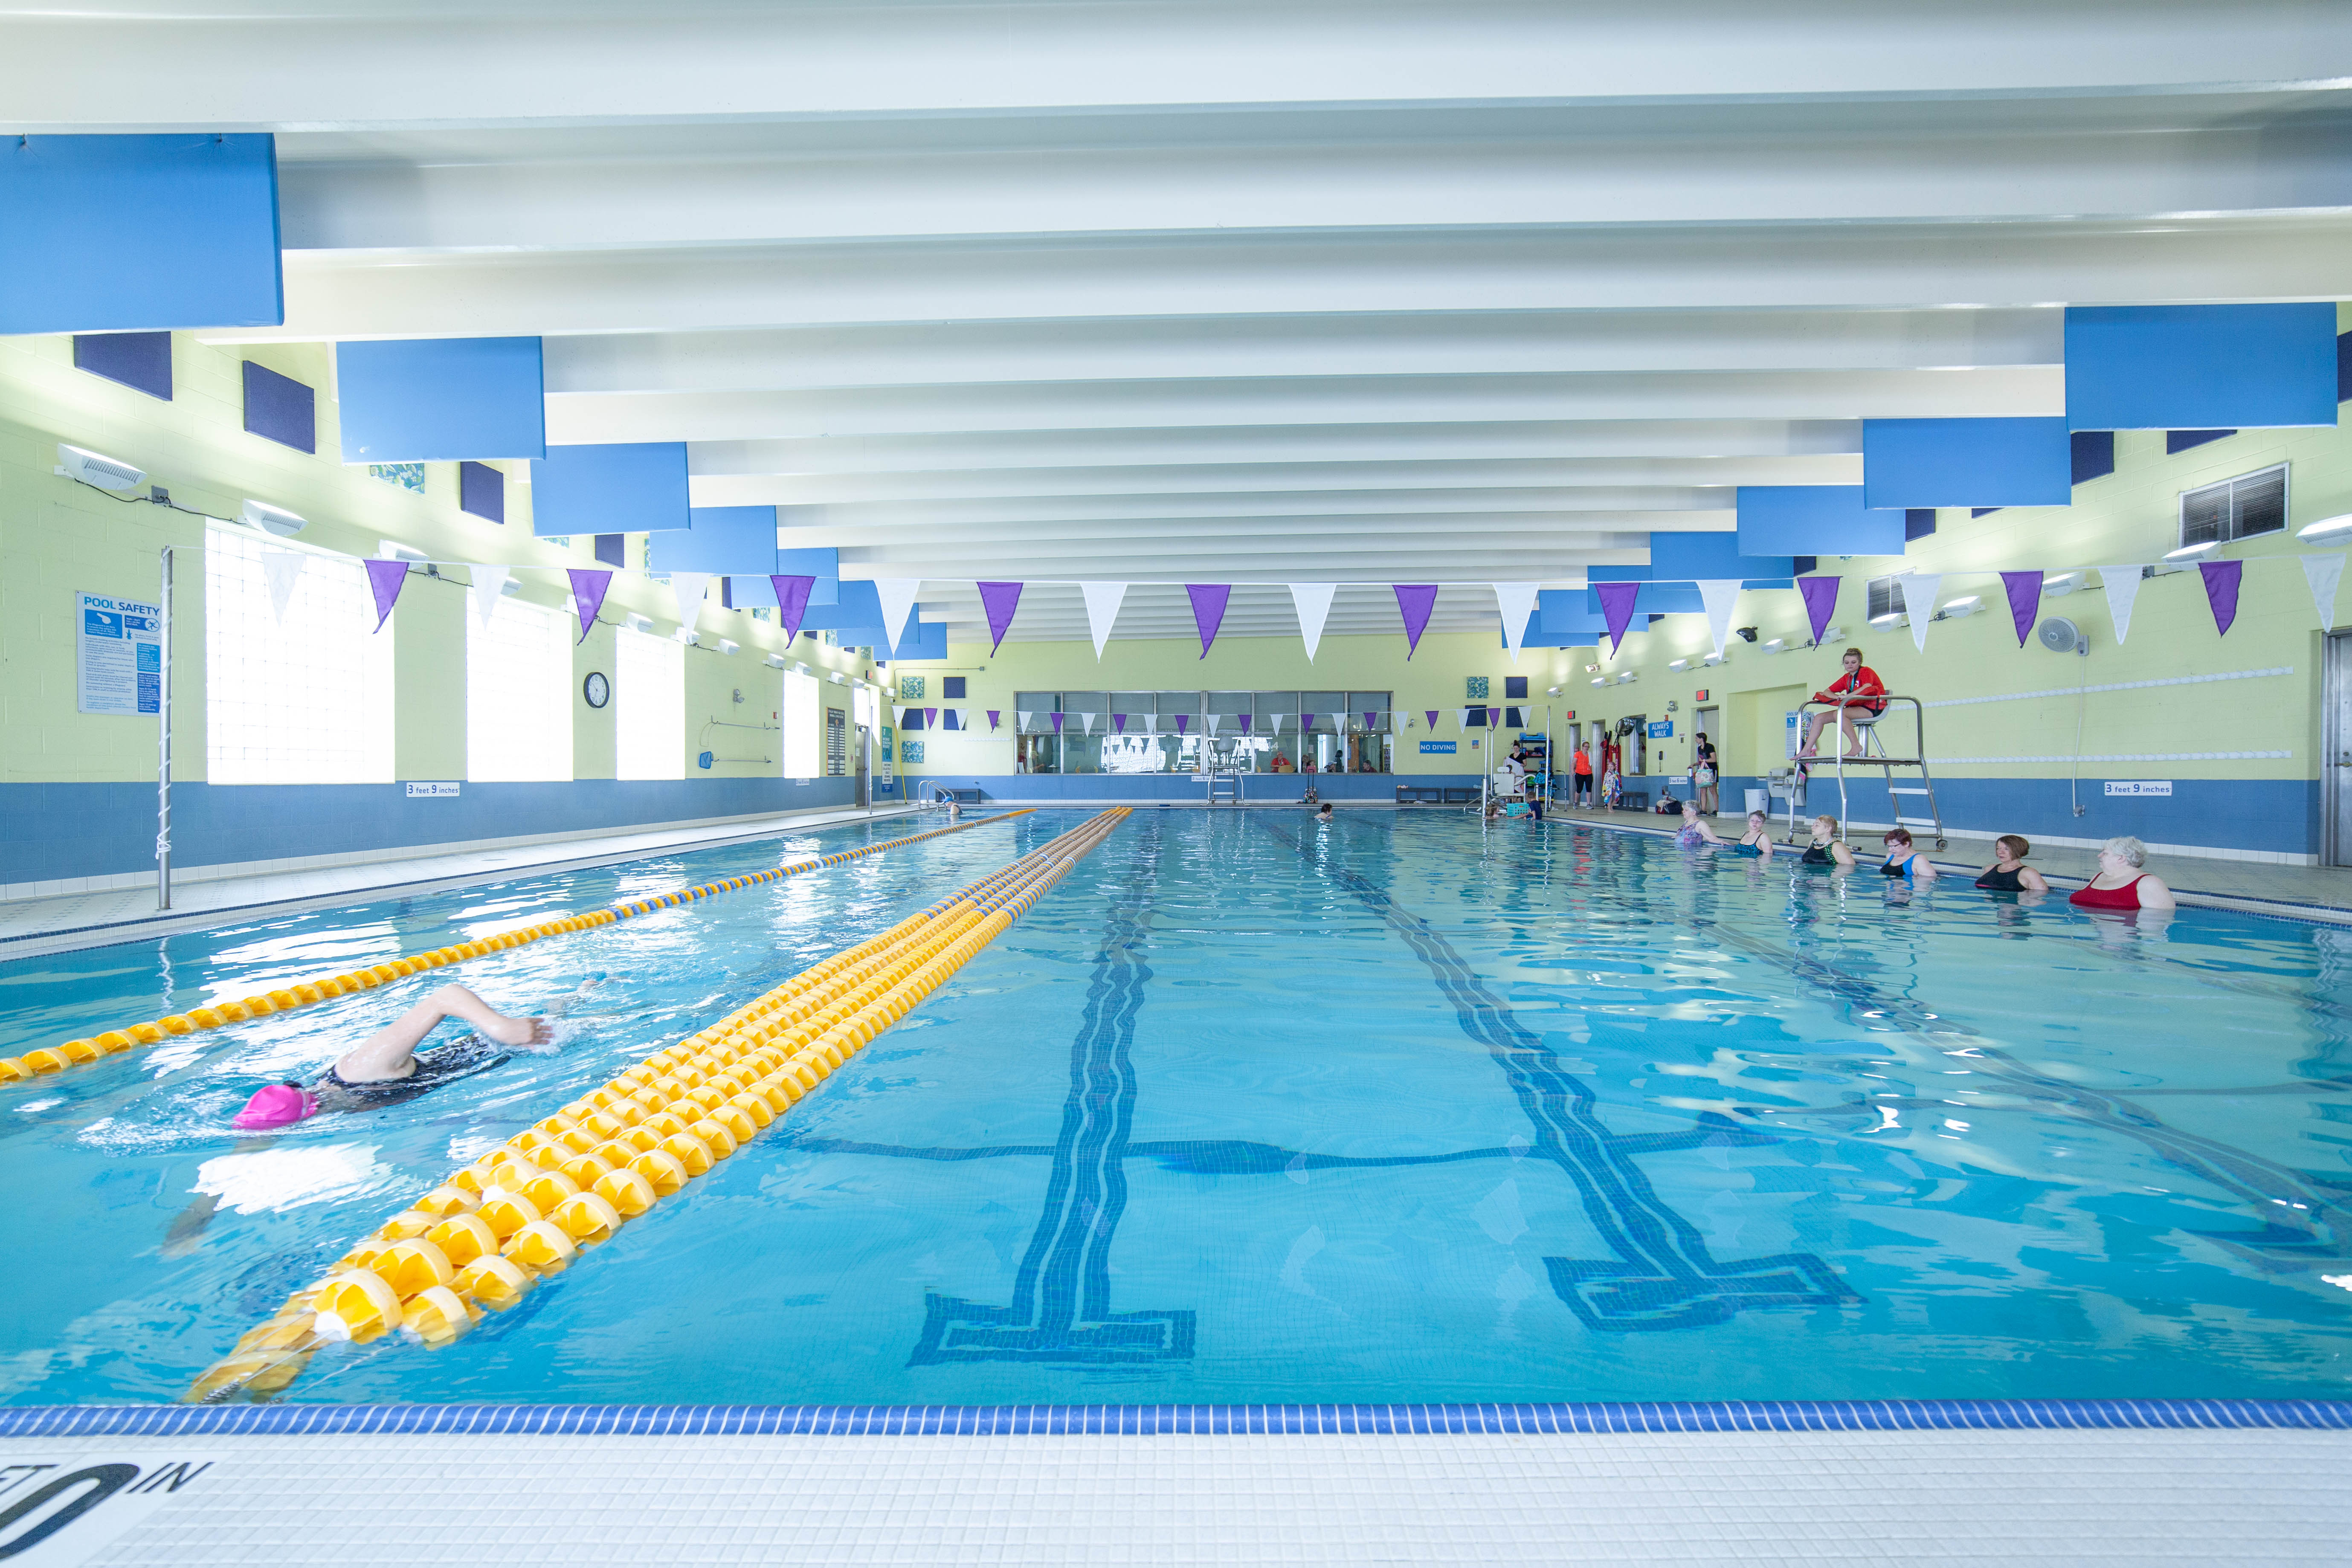 Image 4 | O'Fallon Illinois YMCA